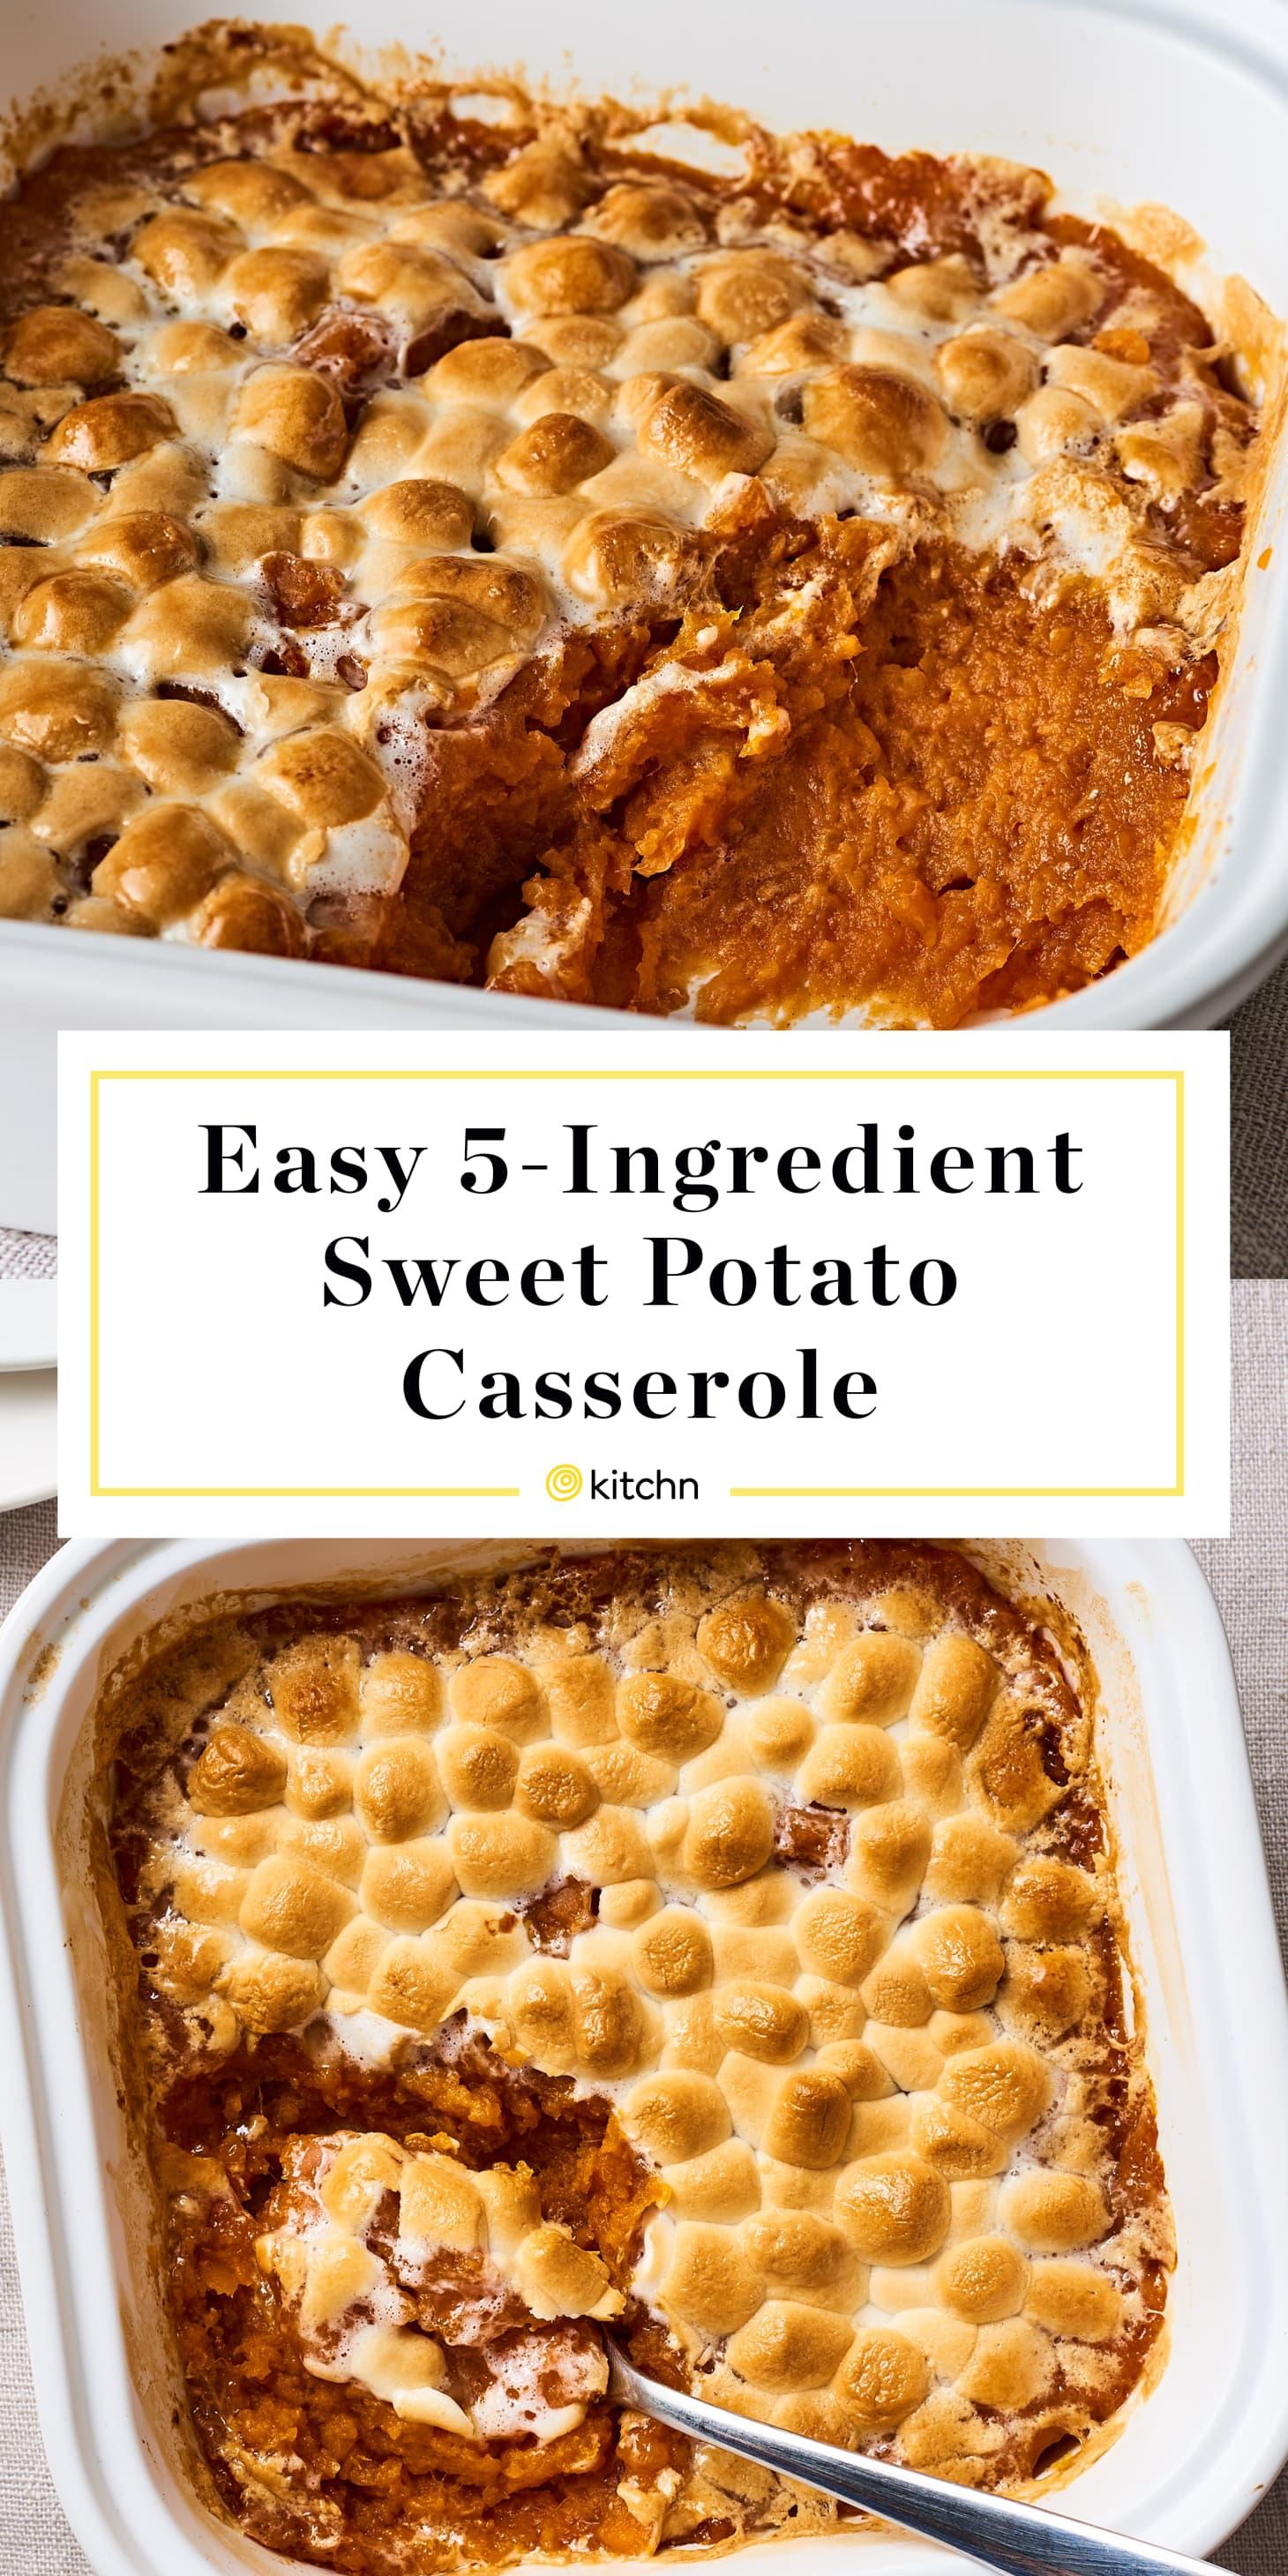 Easy Sweet Potato Casserole Recipe | Kitchn